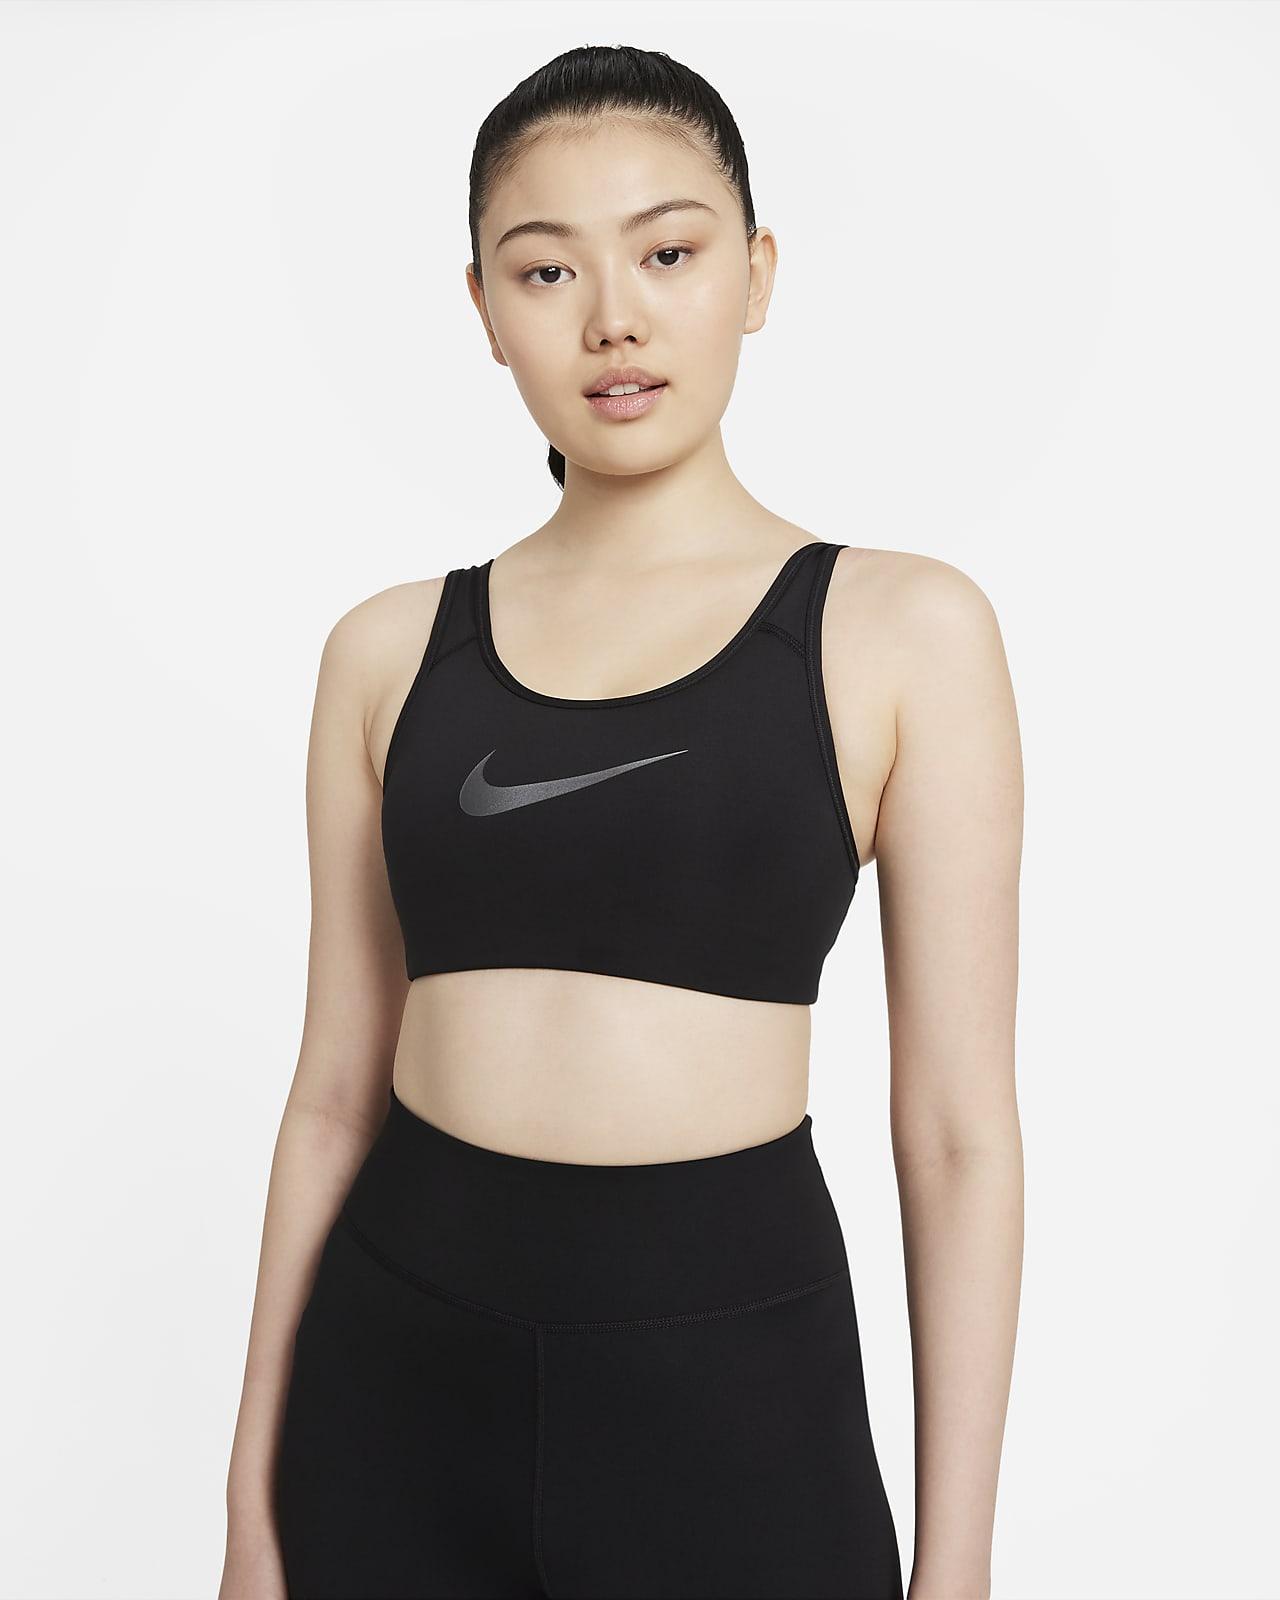 Nike Dri-FIT Swoosh Icon Clash Women's Medium-Support 1-Piece Pad Strappy Sports Bra